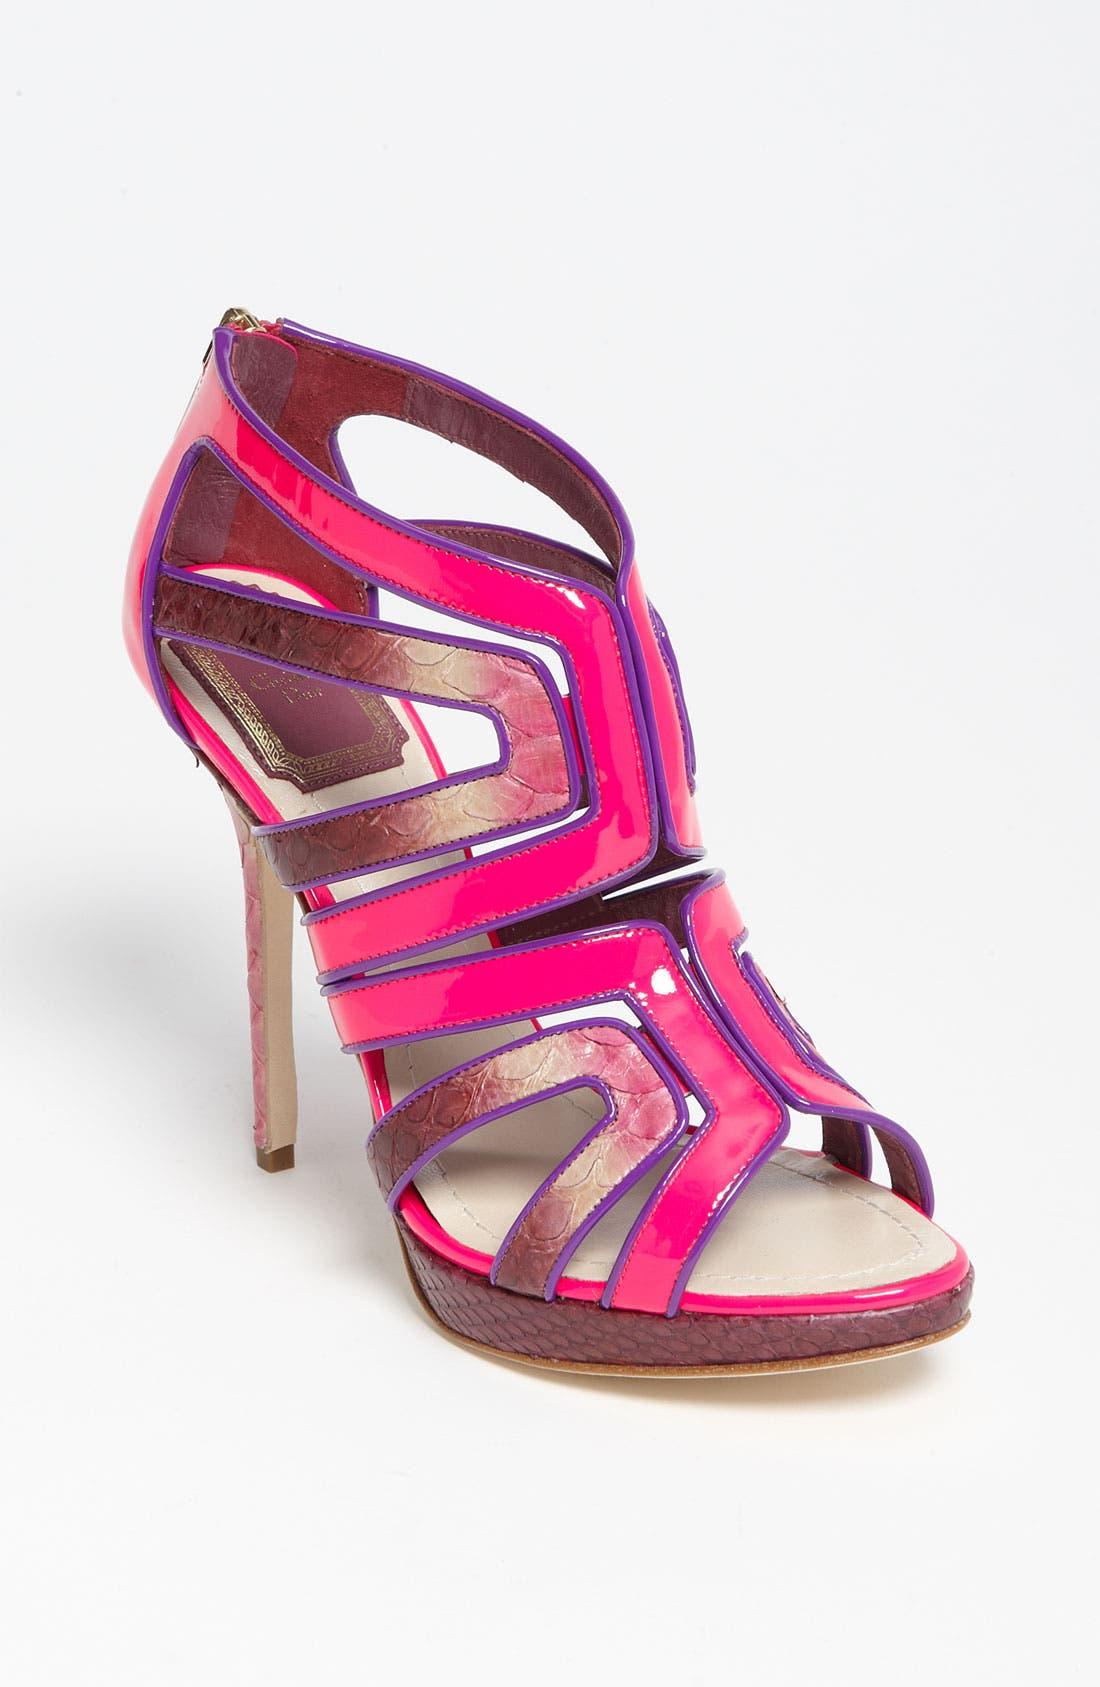 Main Image - Dior 'Intense' Genuine Python Sandal